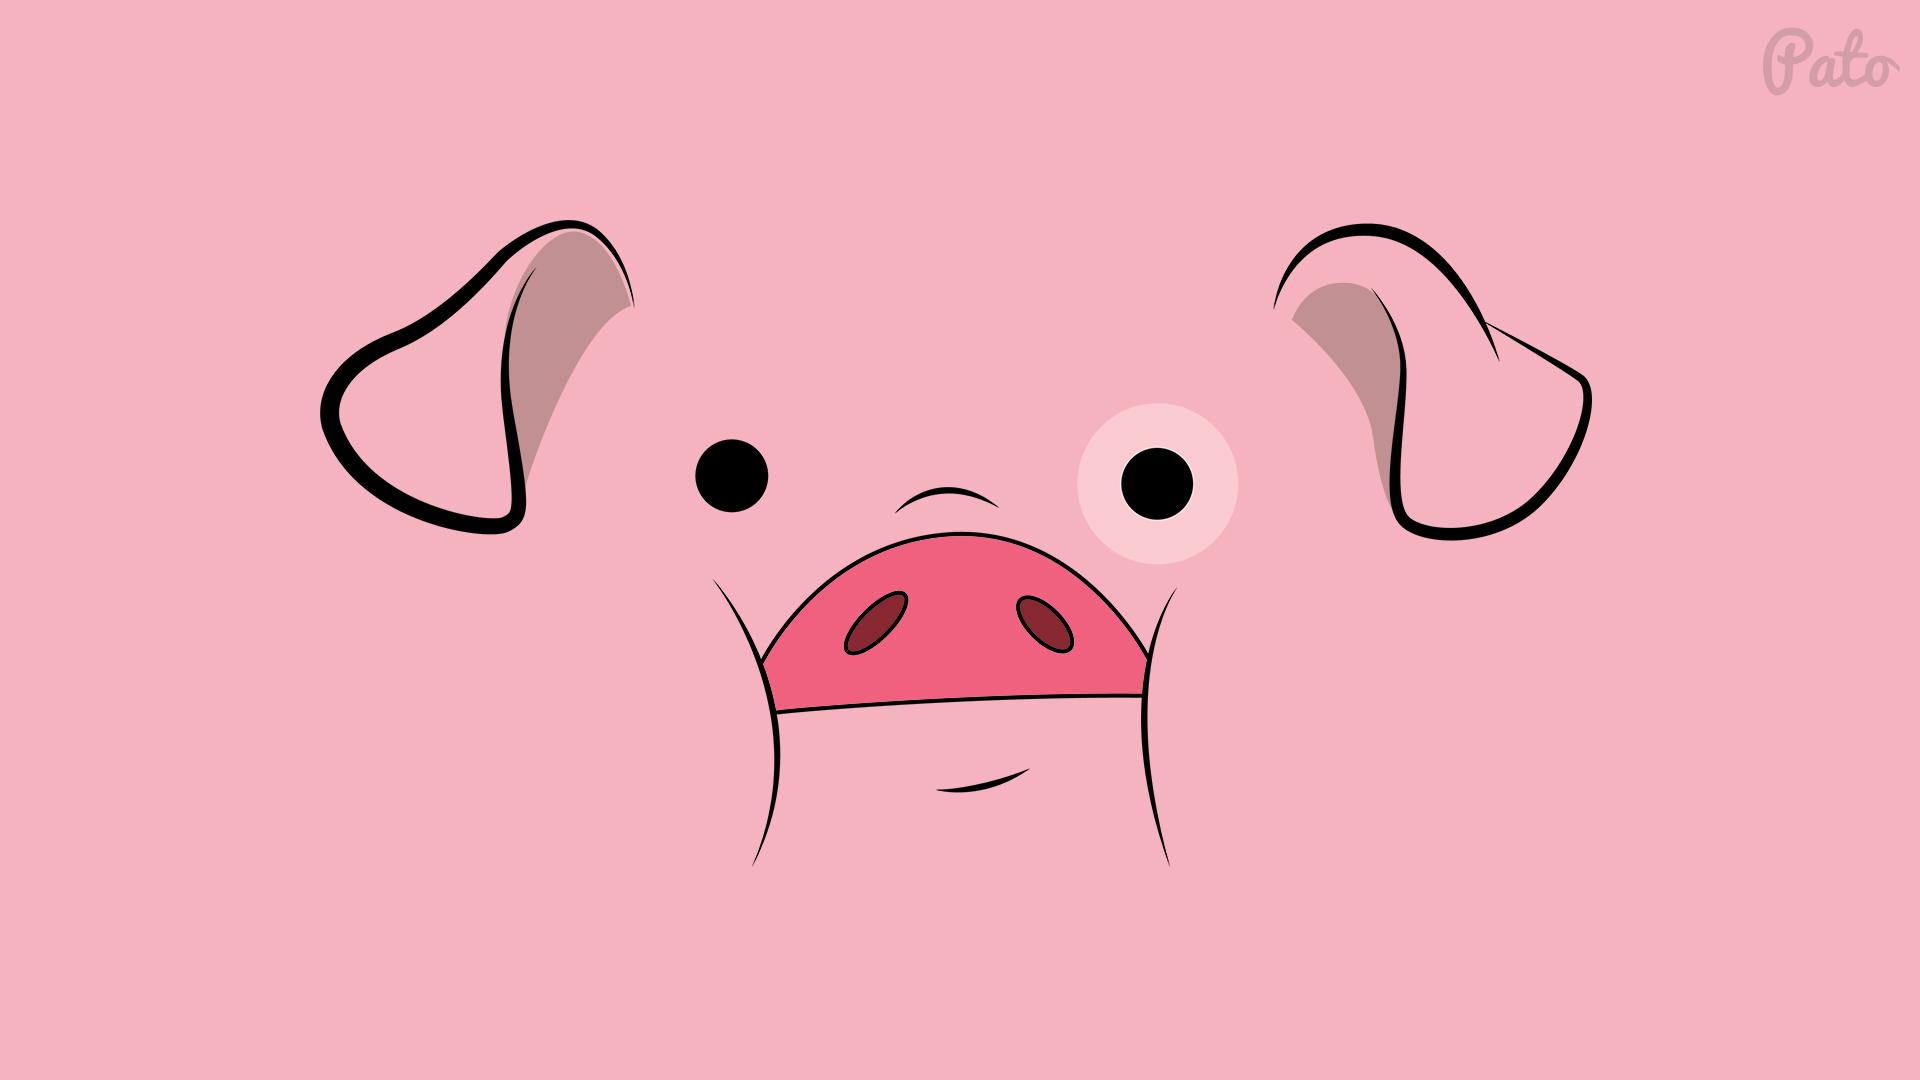 Cute Baby Pig Wallpaper Free Stock Photo Of Gravity Falls Pato Ping